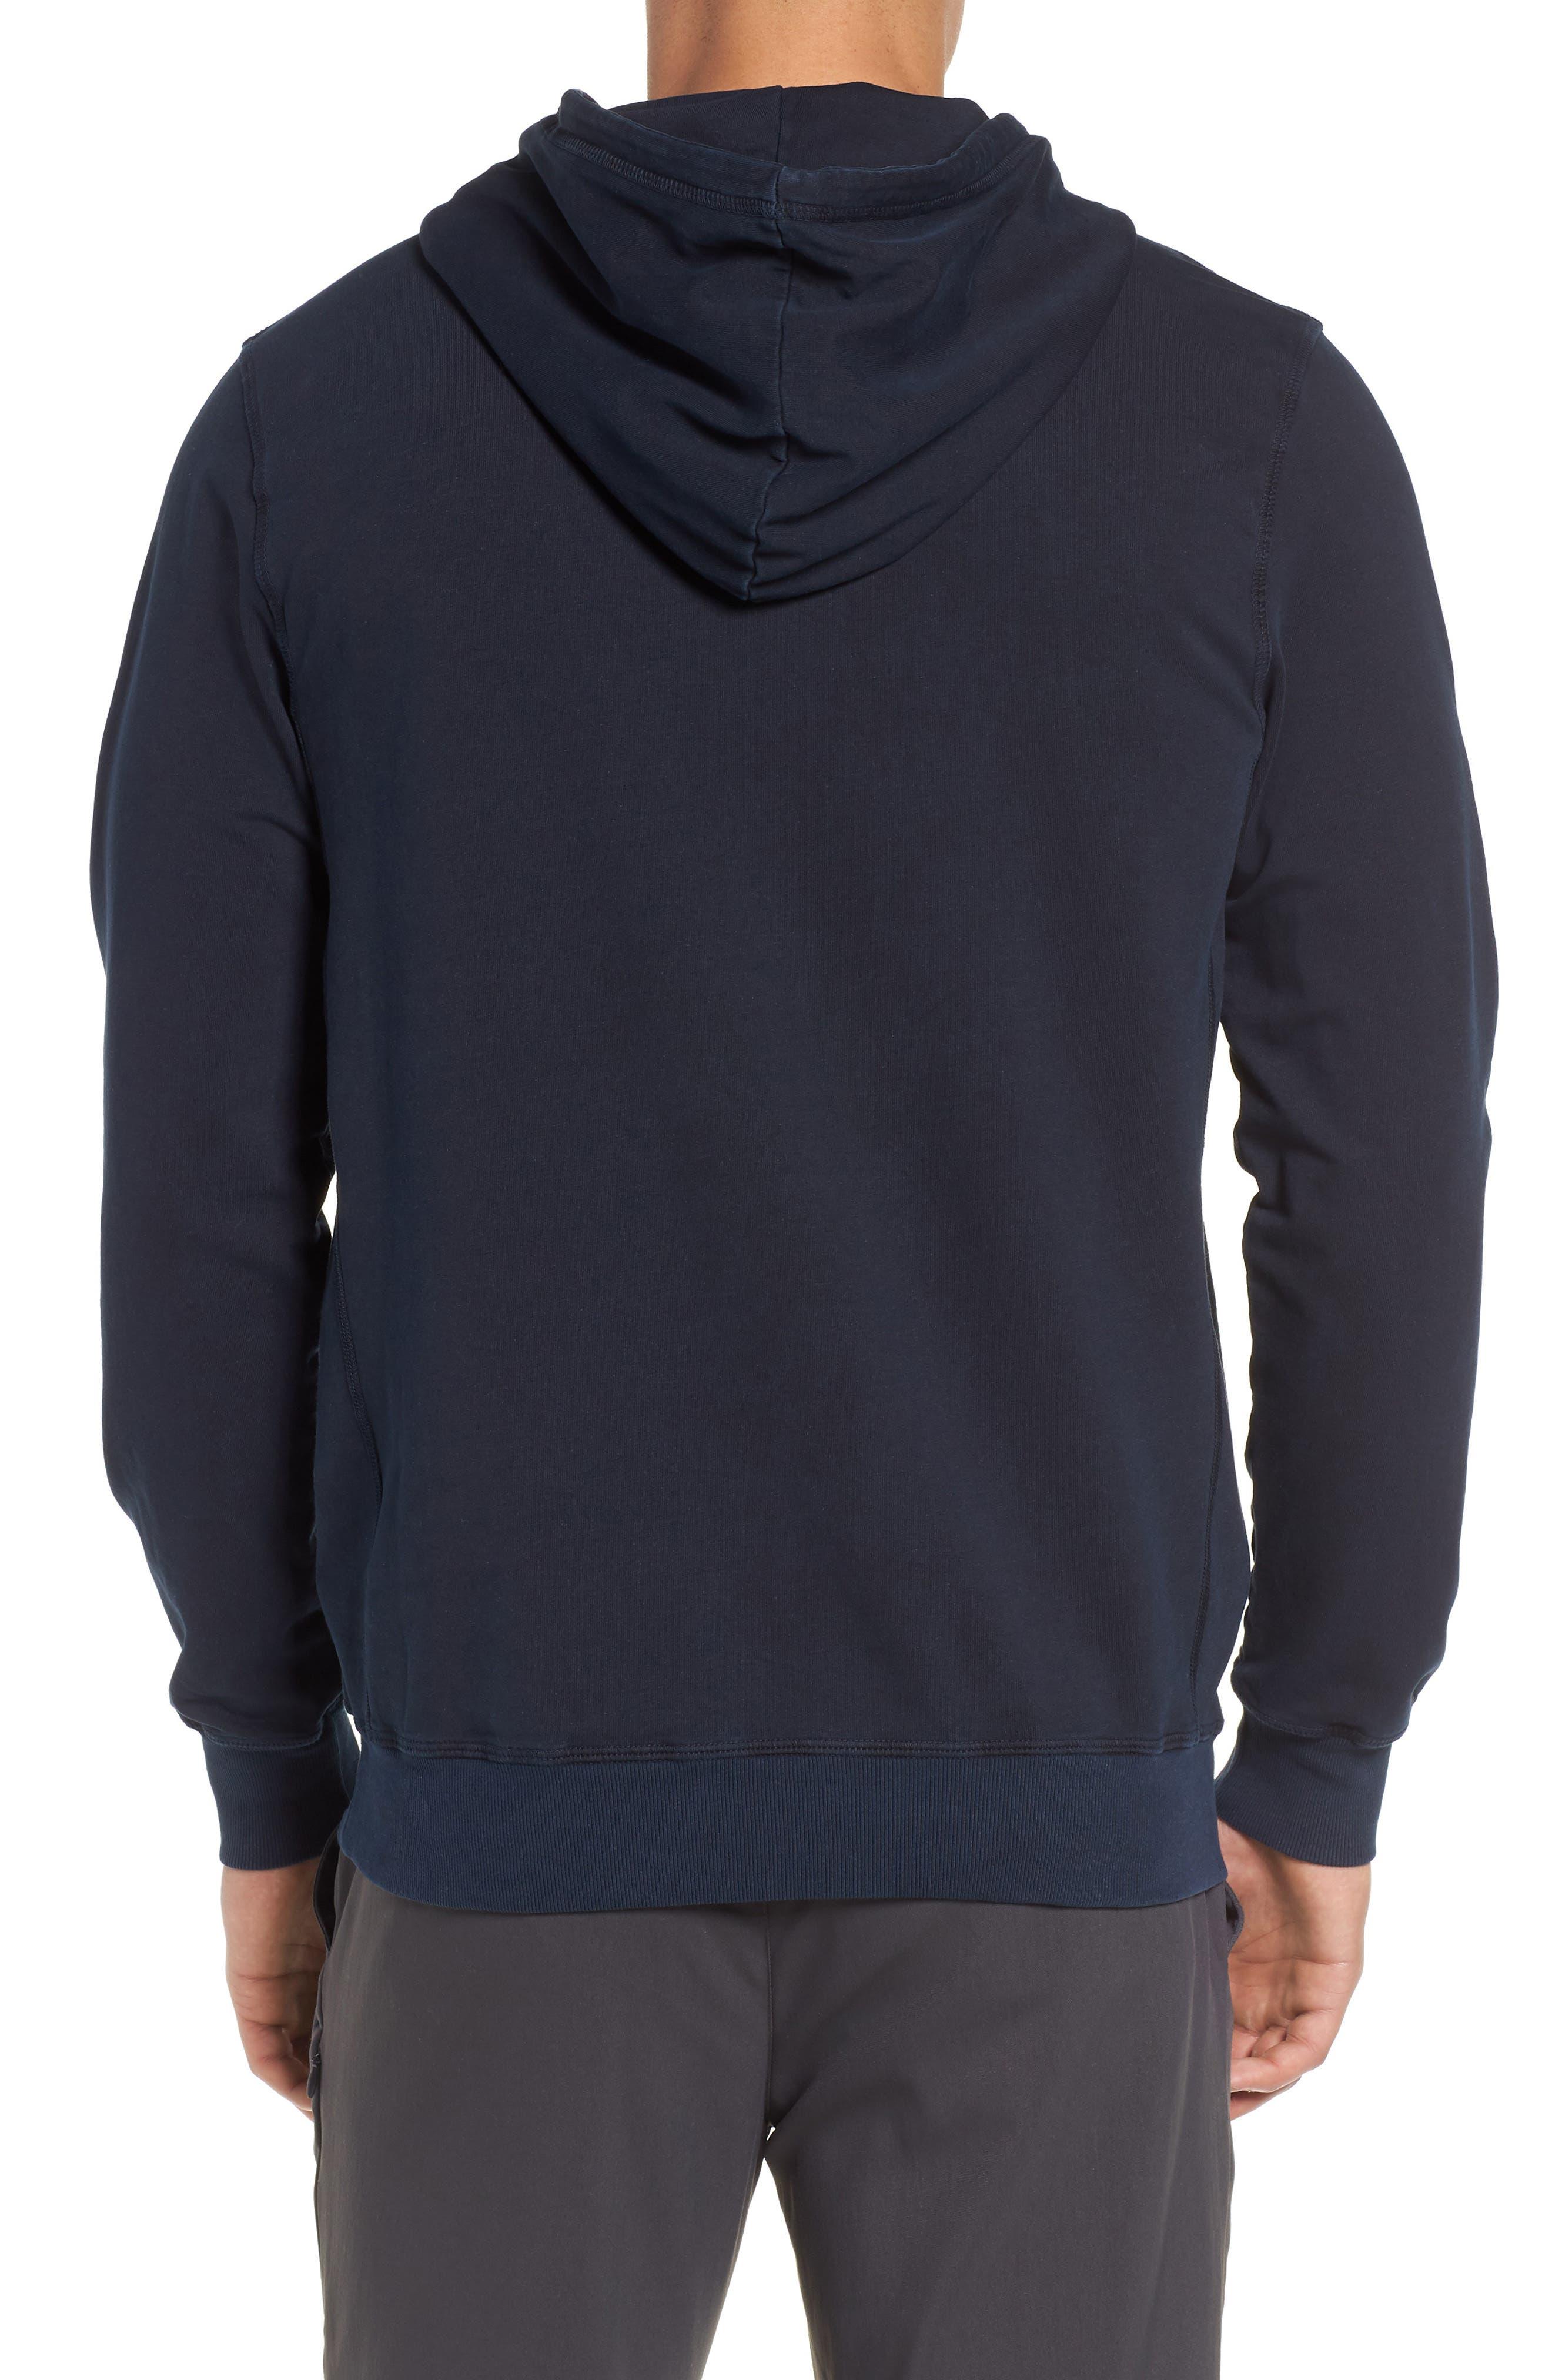 S.O.M. Hoodie Sweatshirt,                             Alternate thumbnail 2, color,                             410